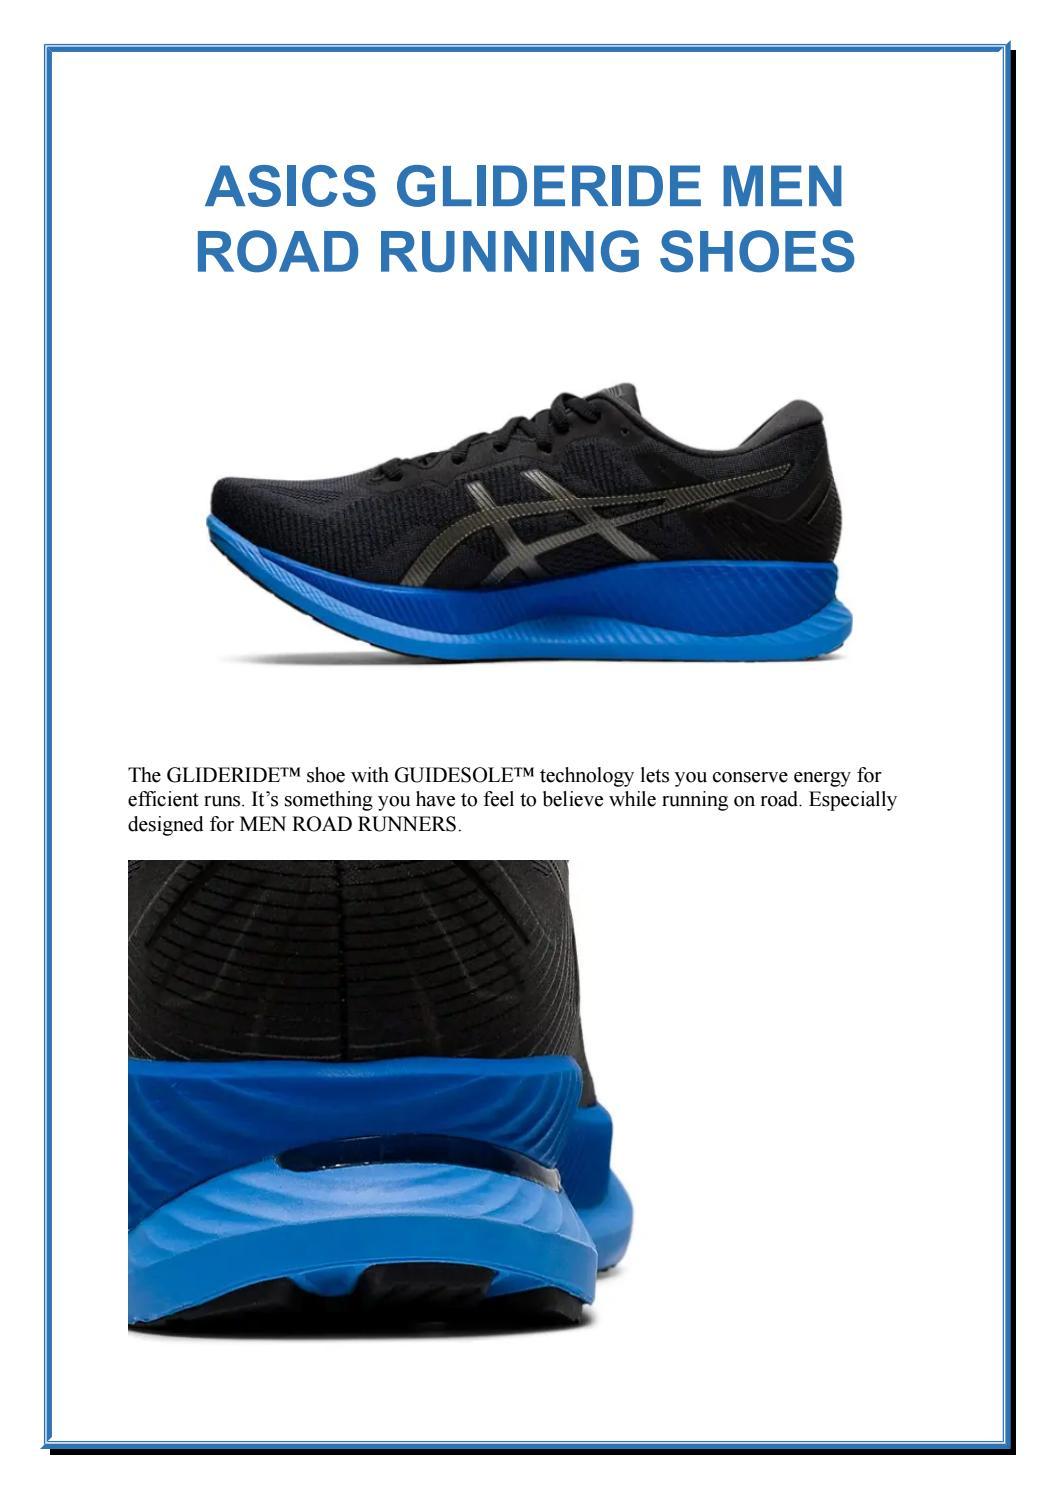 ASICS GLIDERIDE MEN ROAD RUNNING SHOES